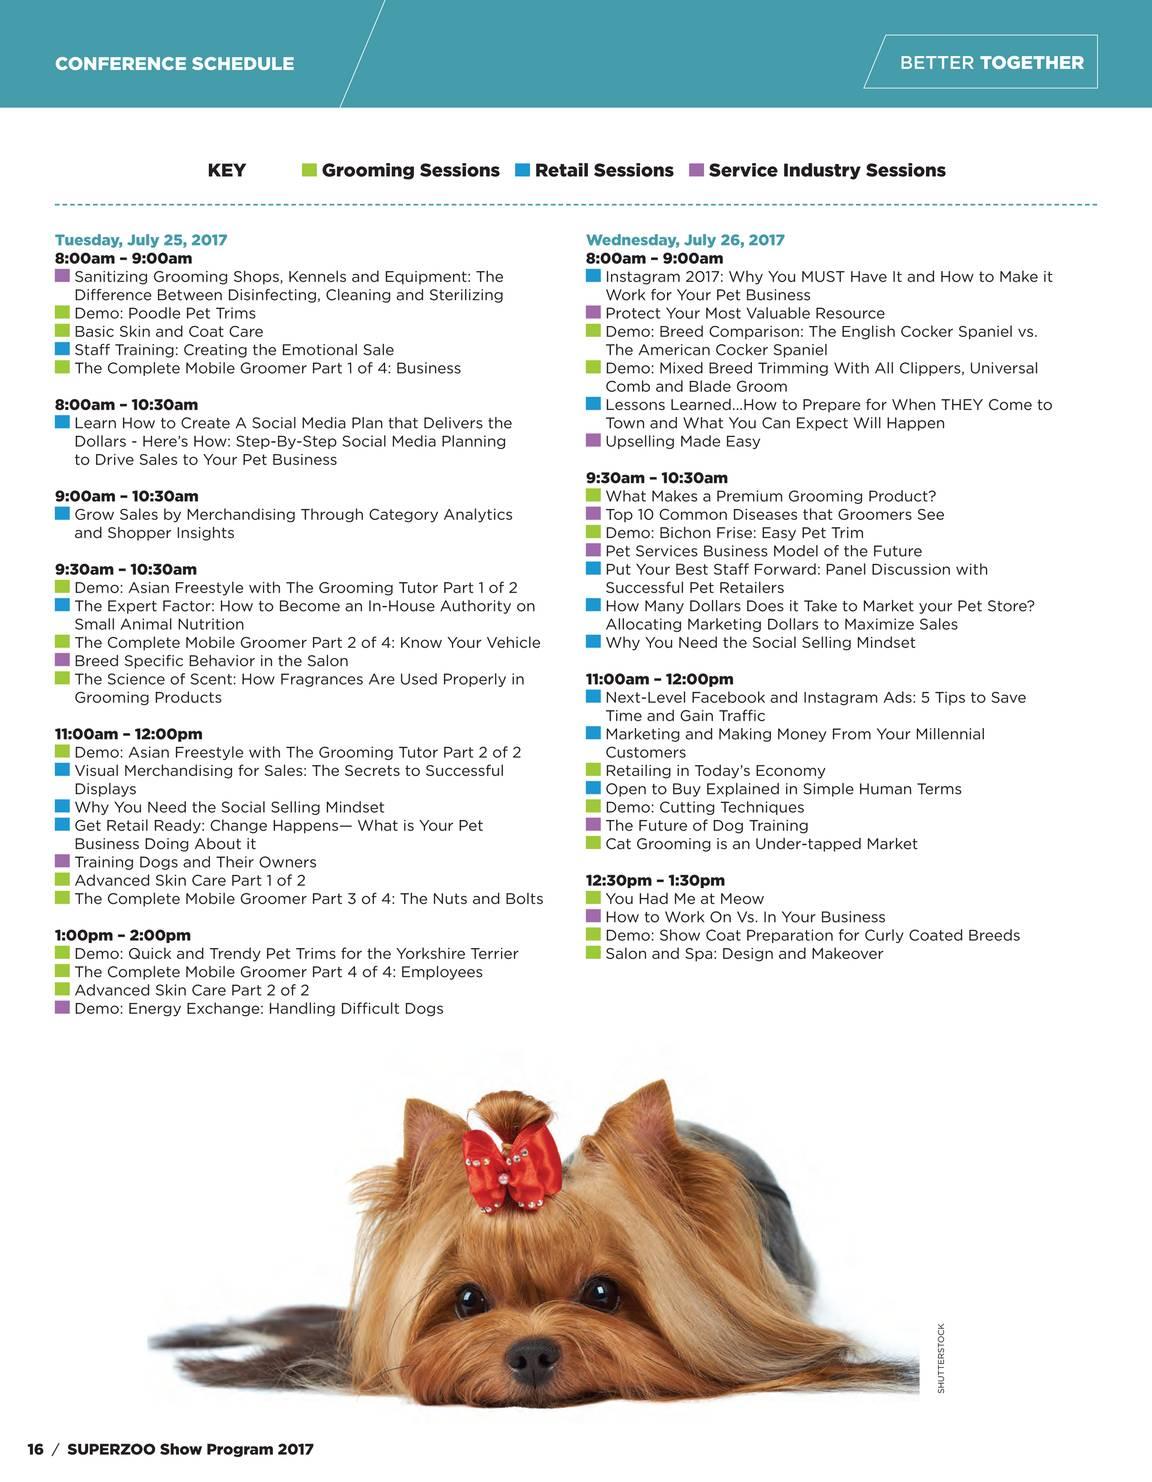 Pet Product News - SuperZoo Show Program 2017 - page 16